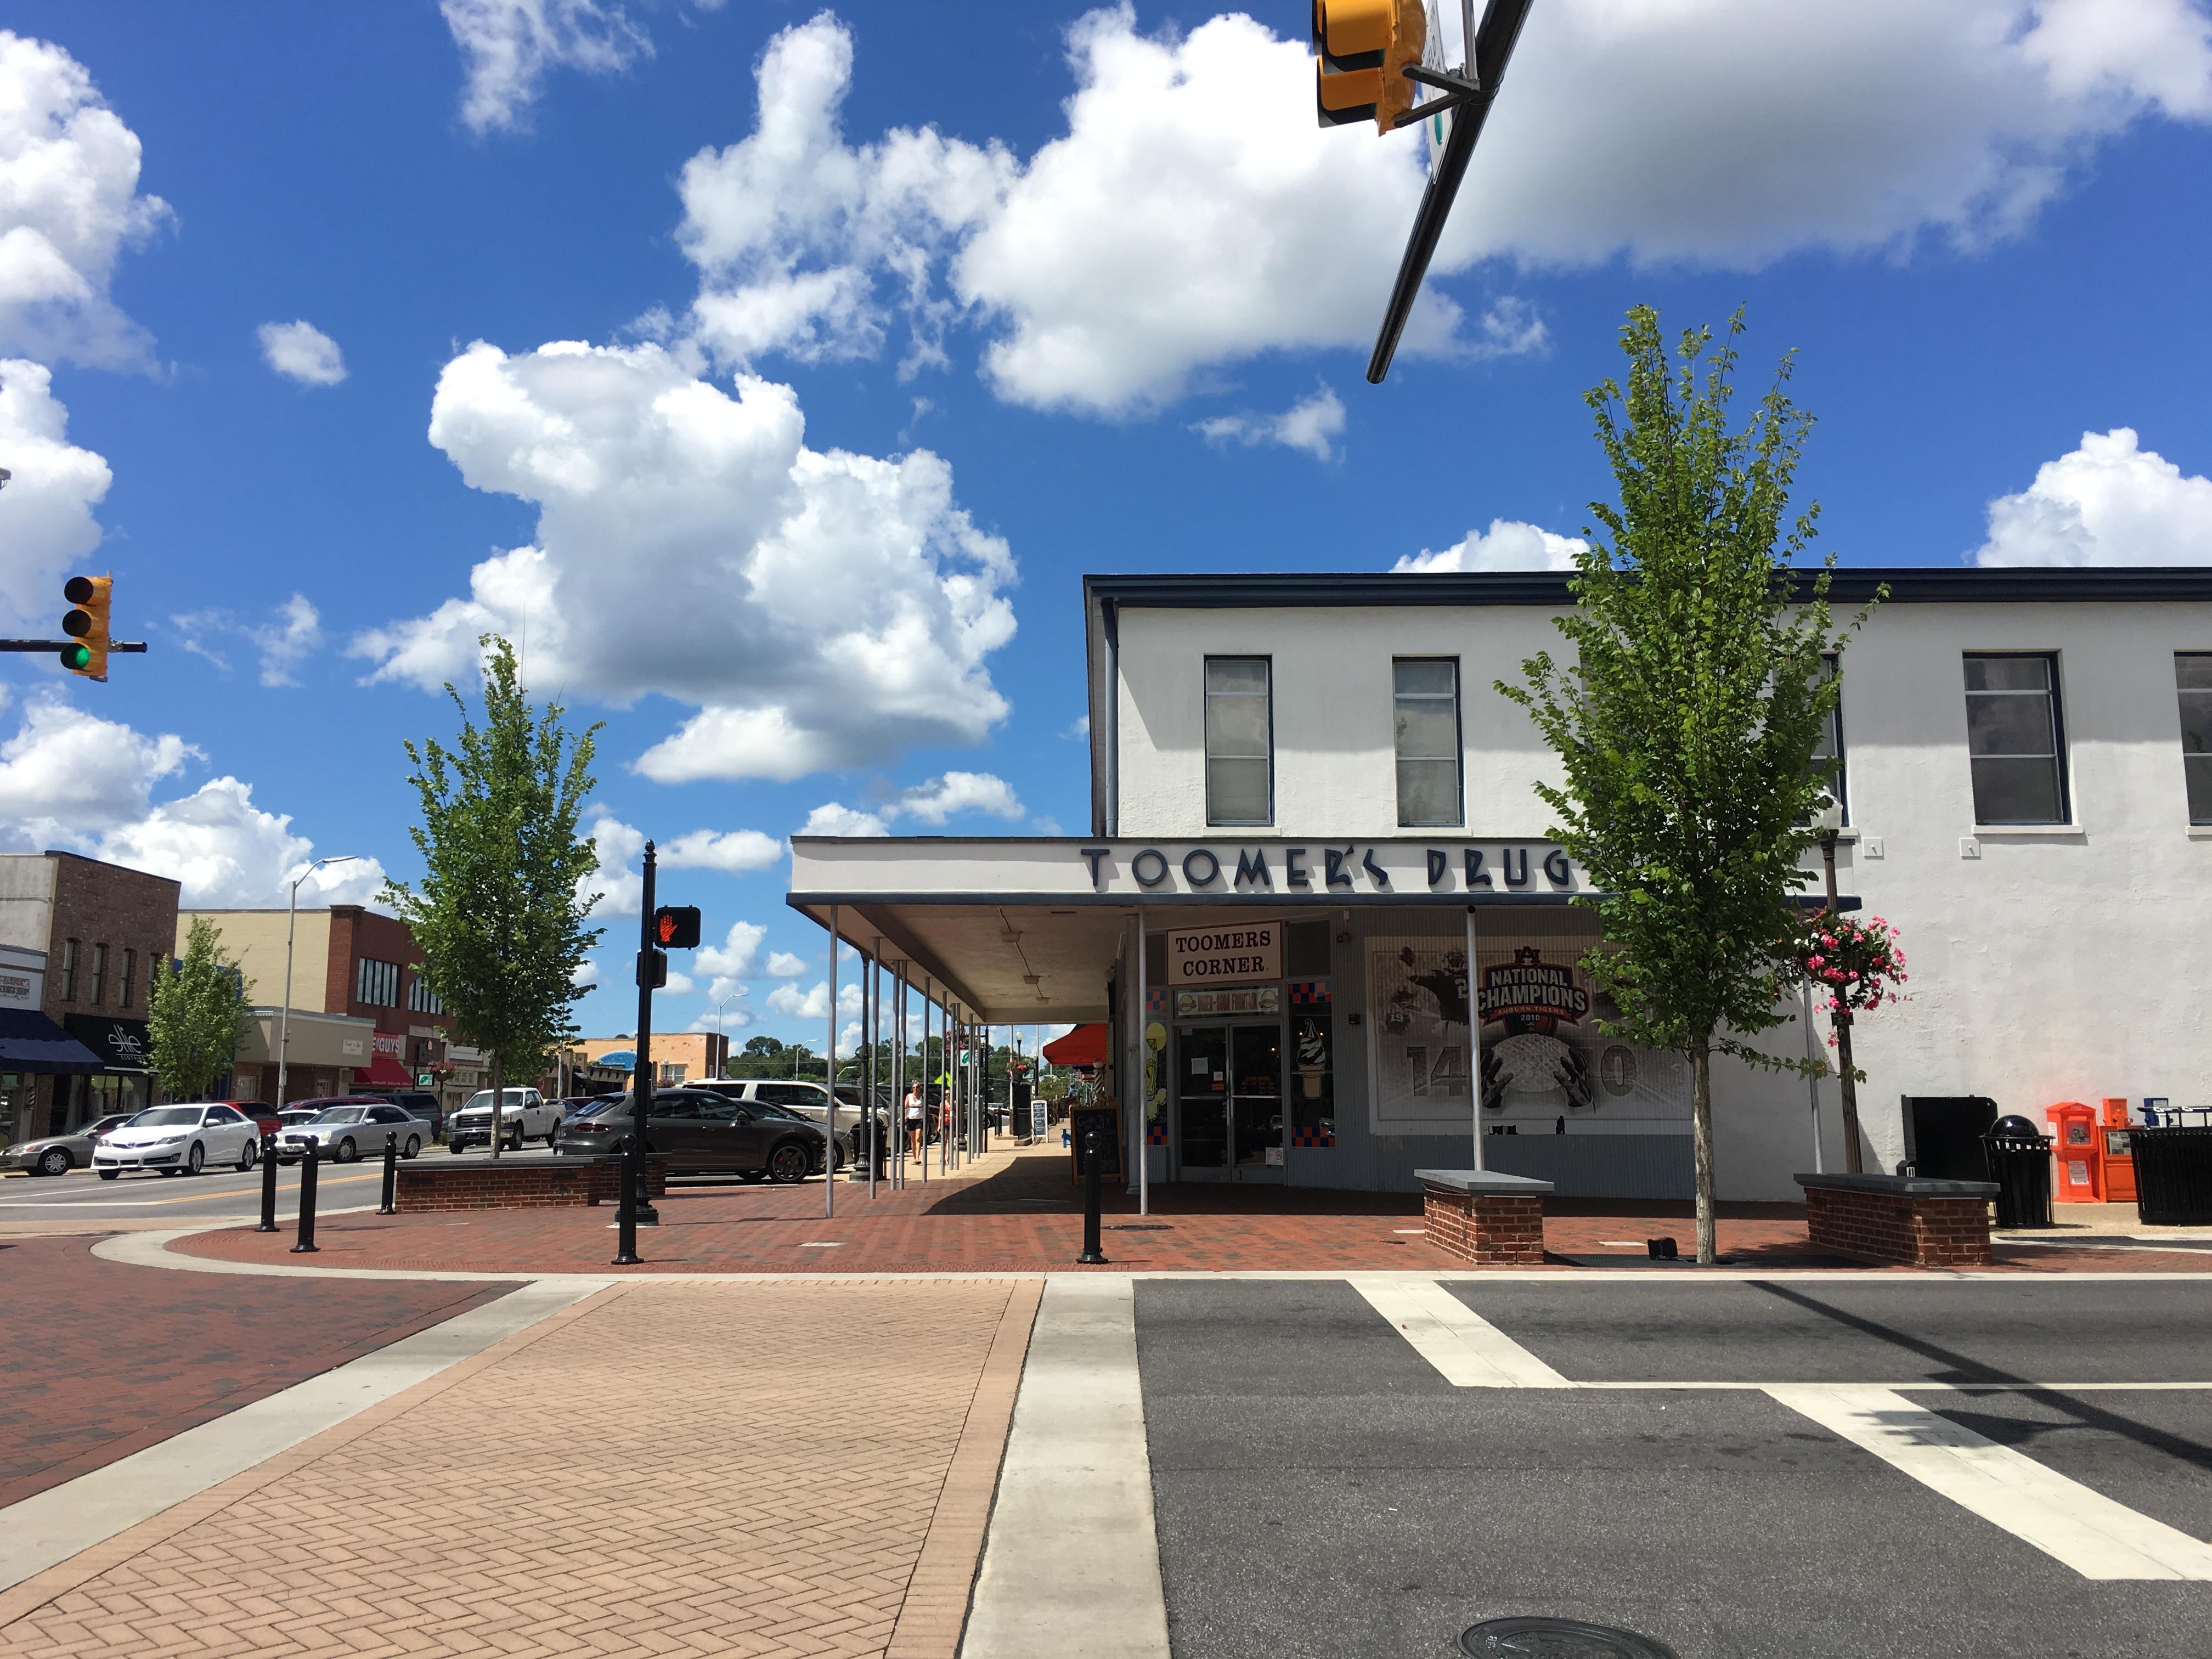 Auburn and Opelika Tourism Bureau - Toomers Drugstore